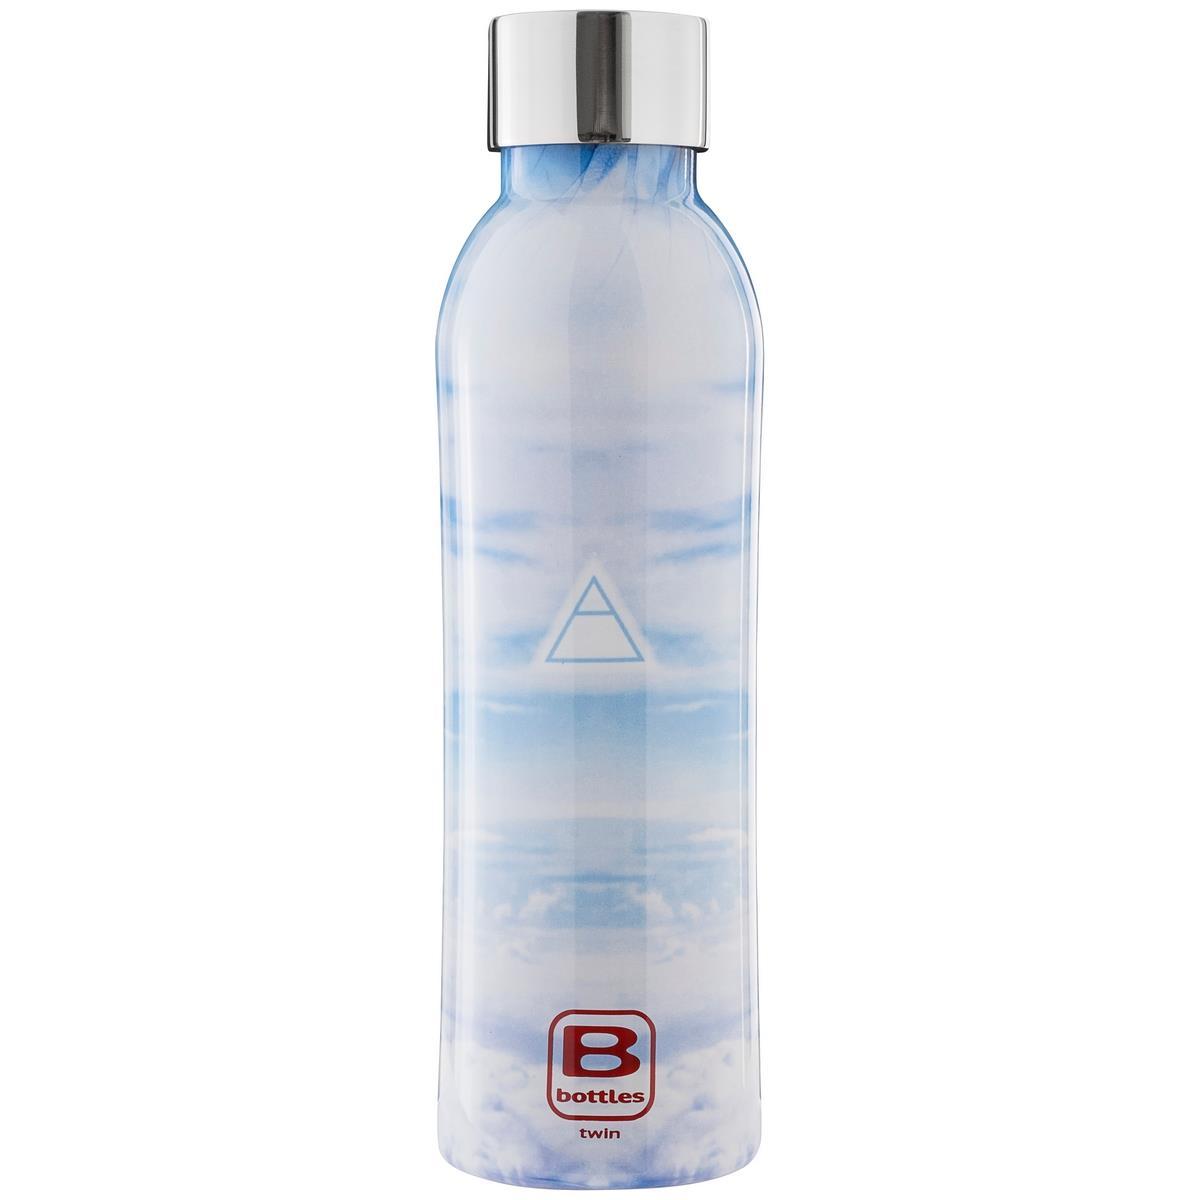 B Bottles Twin - Aria Element - 500 ml - Bottiglia Termica a doppia parete in acciaio inox 18/10